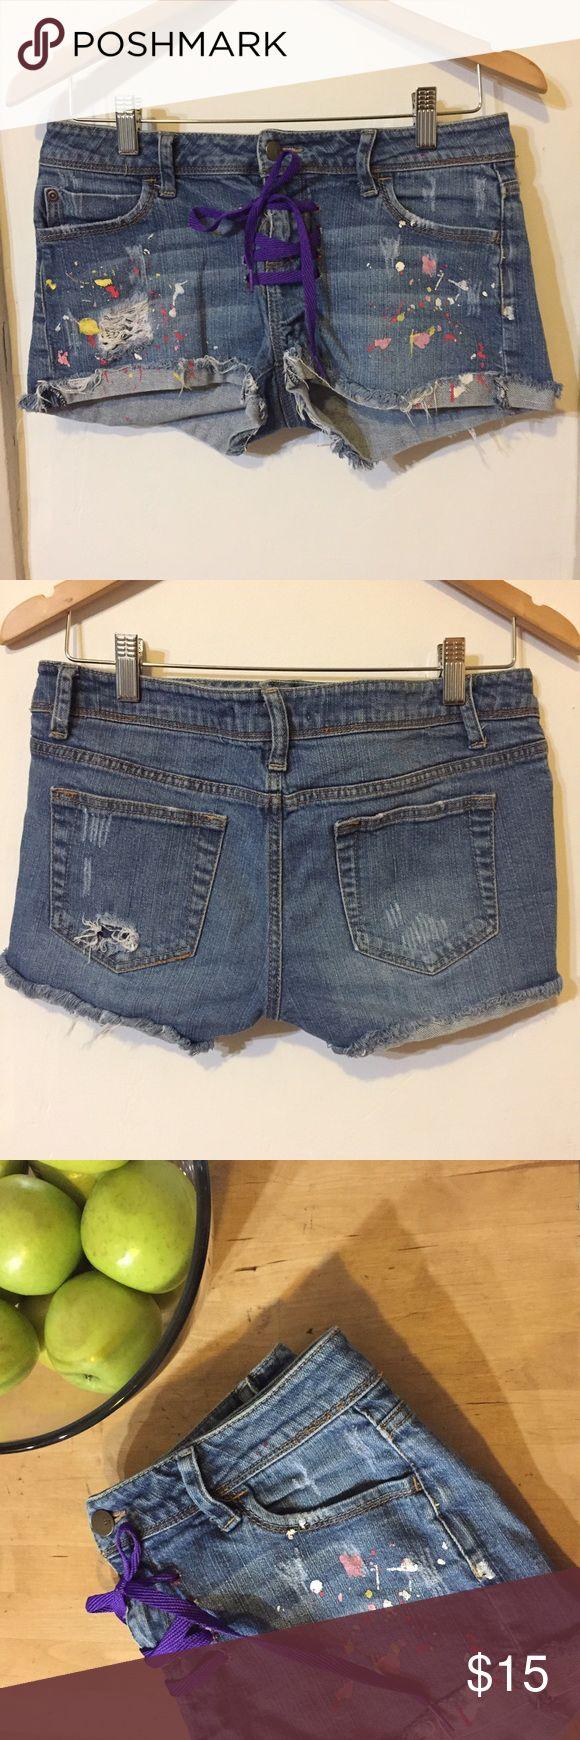 2.1 Denim distressed paint splatter jean shorts 2.1 Denim distressed paint splatter jean shorts with shoelace tie front, EUC. 10 inches in length. 2.1 Denim Shorts Jean Shorts